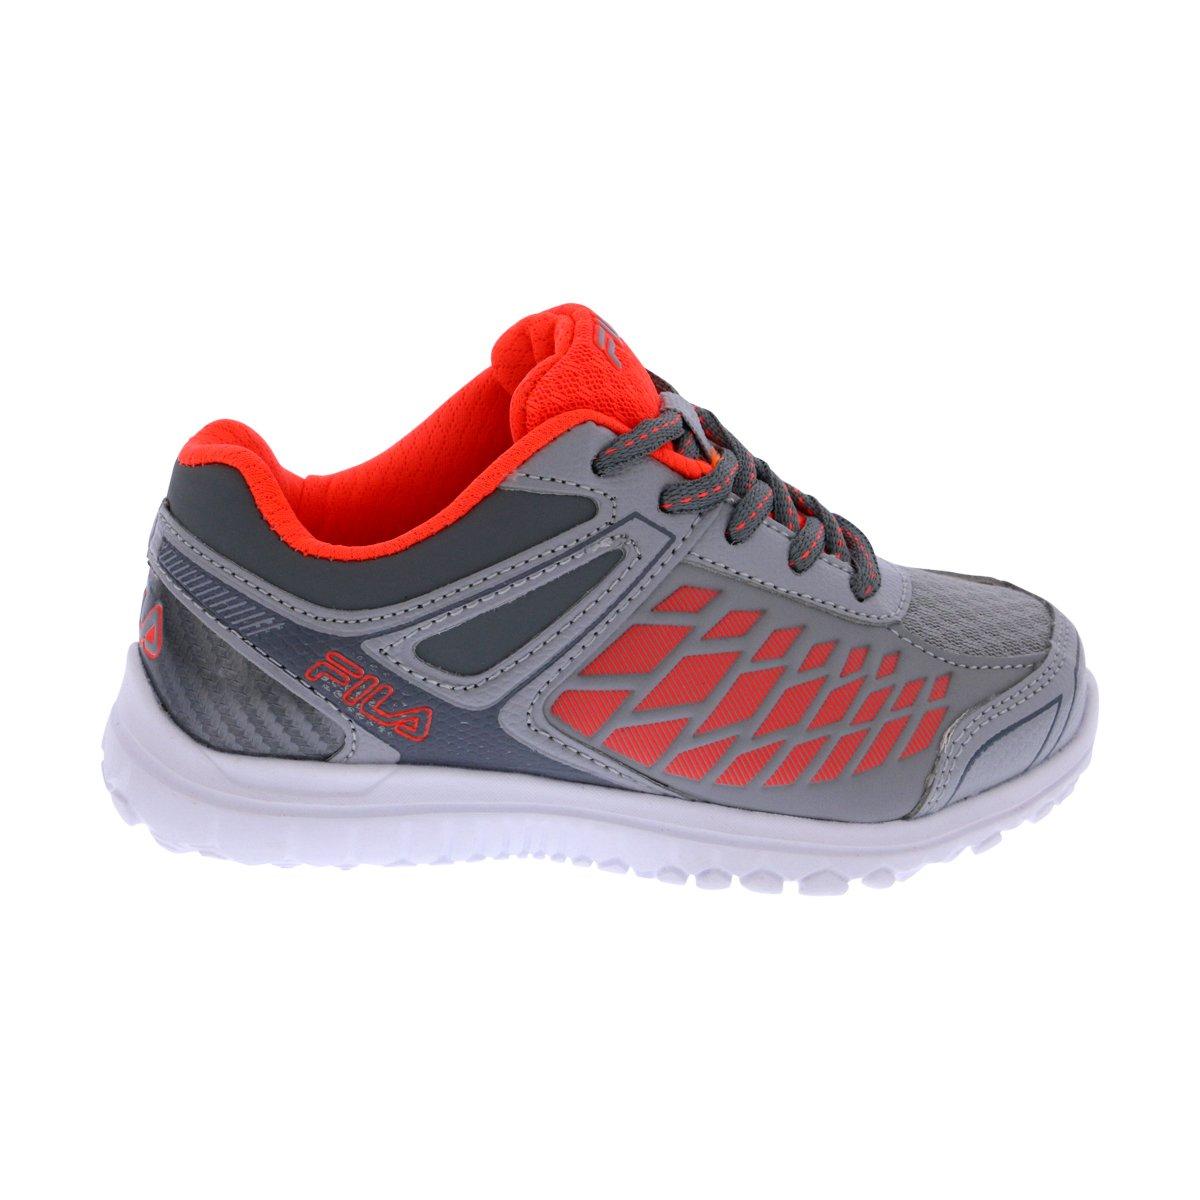 Fila Lightning Strike Kid's Shoes Size 3 Grey/Orange